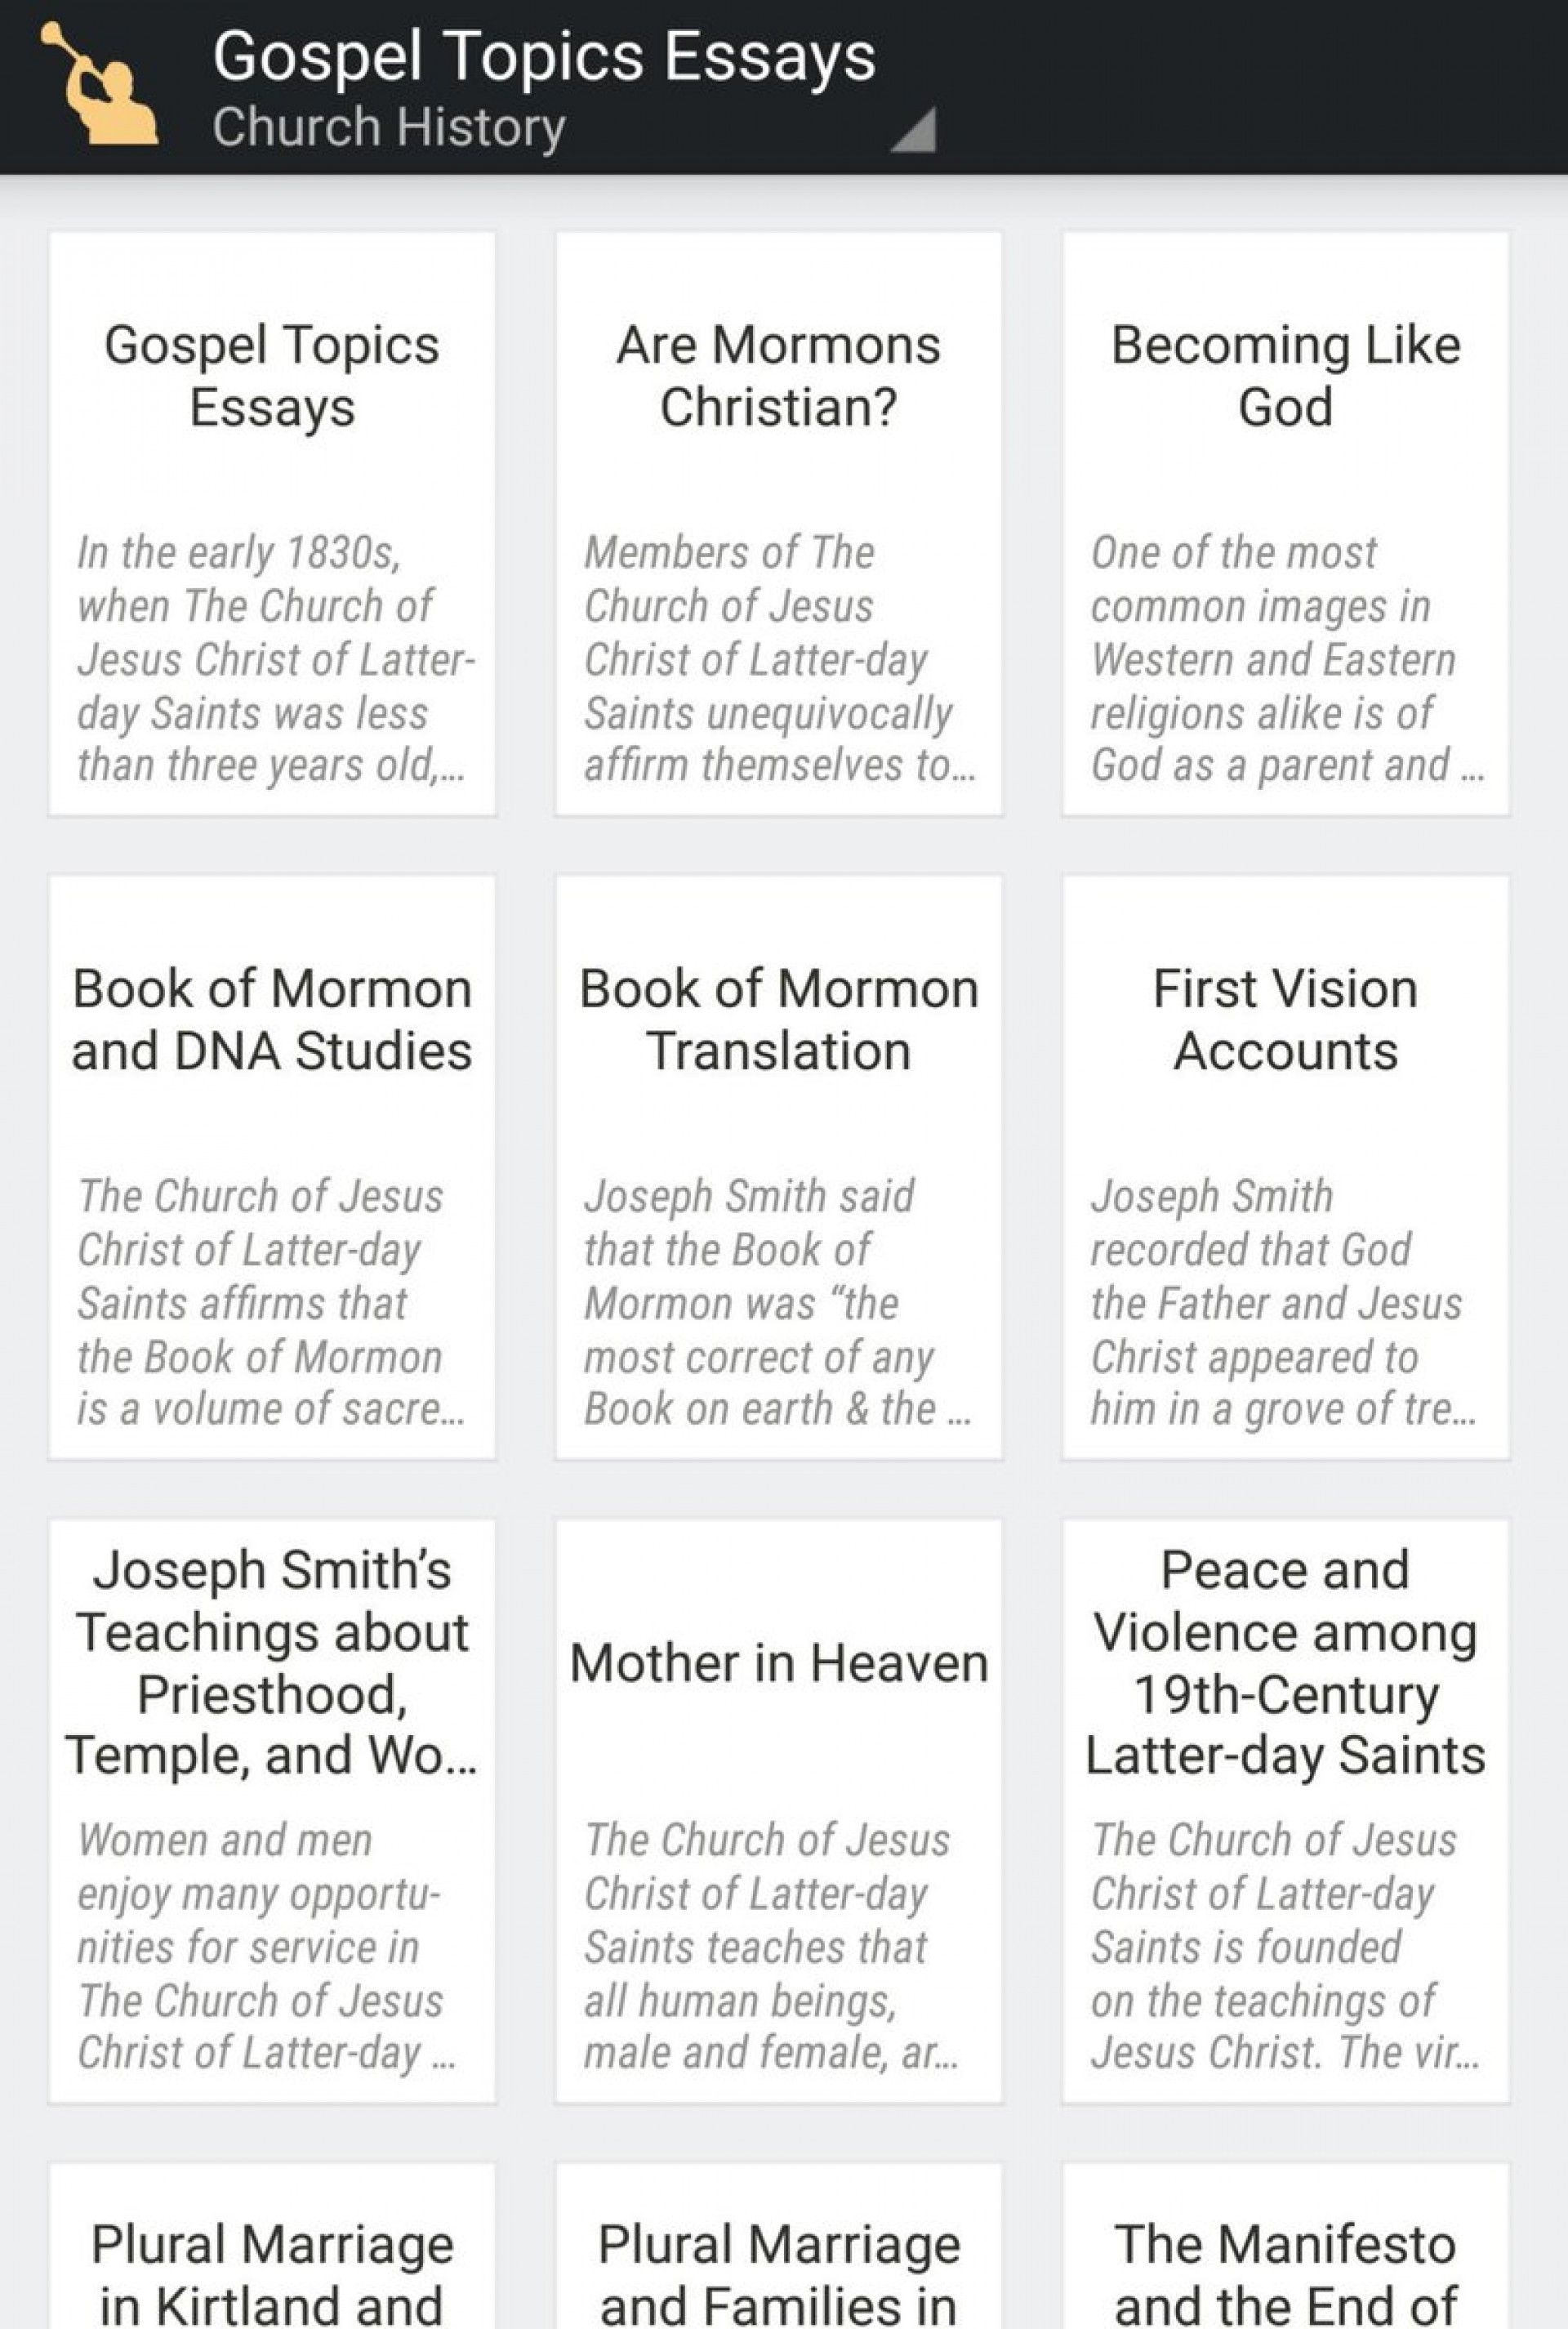 013 Gospel Topics Essays Chjy Kbveaadaux Essay Outstanding Book Of Abraham Pdf Mormon Translation 1920